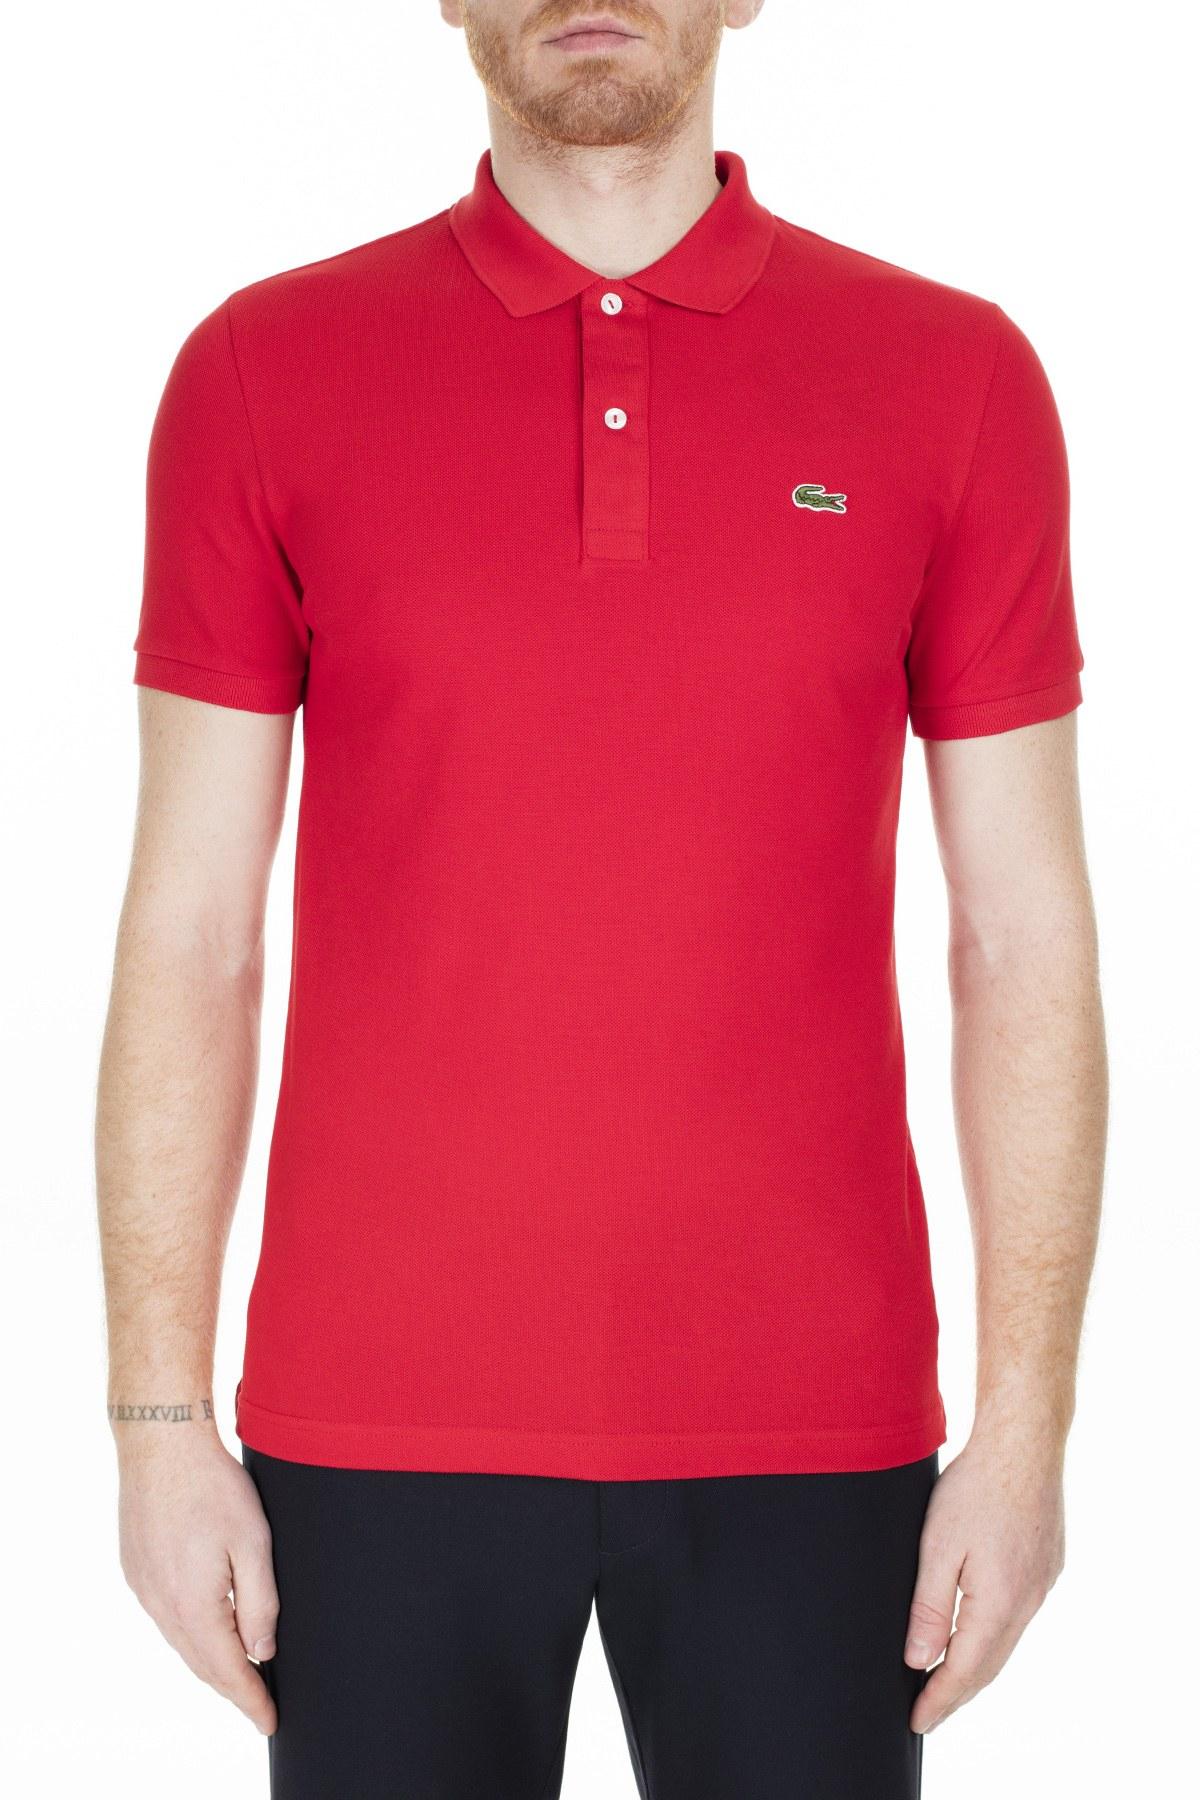 Lacoste Slim Fit T Shirt Erkek Polo PH4012 240 KIRMIZI